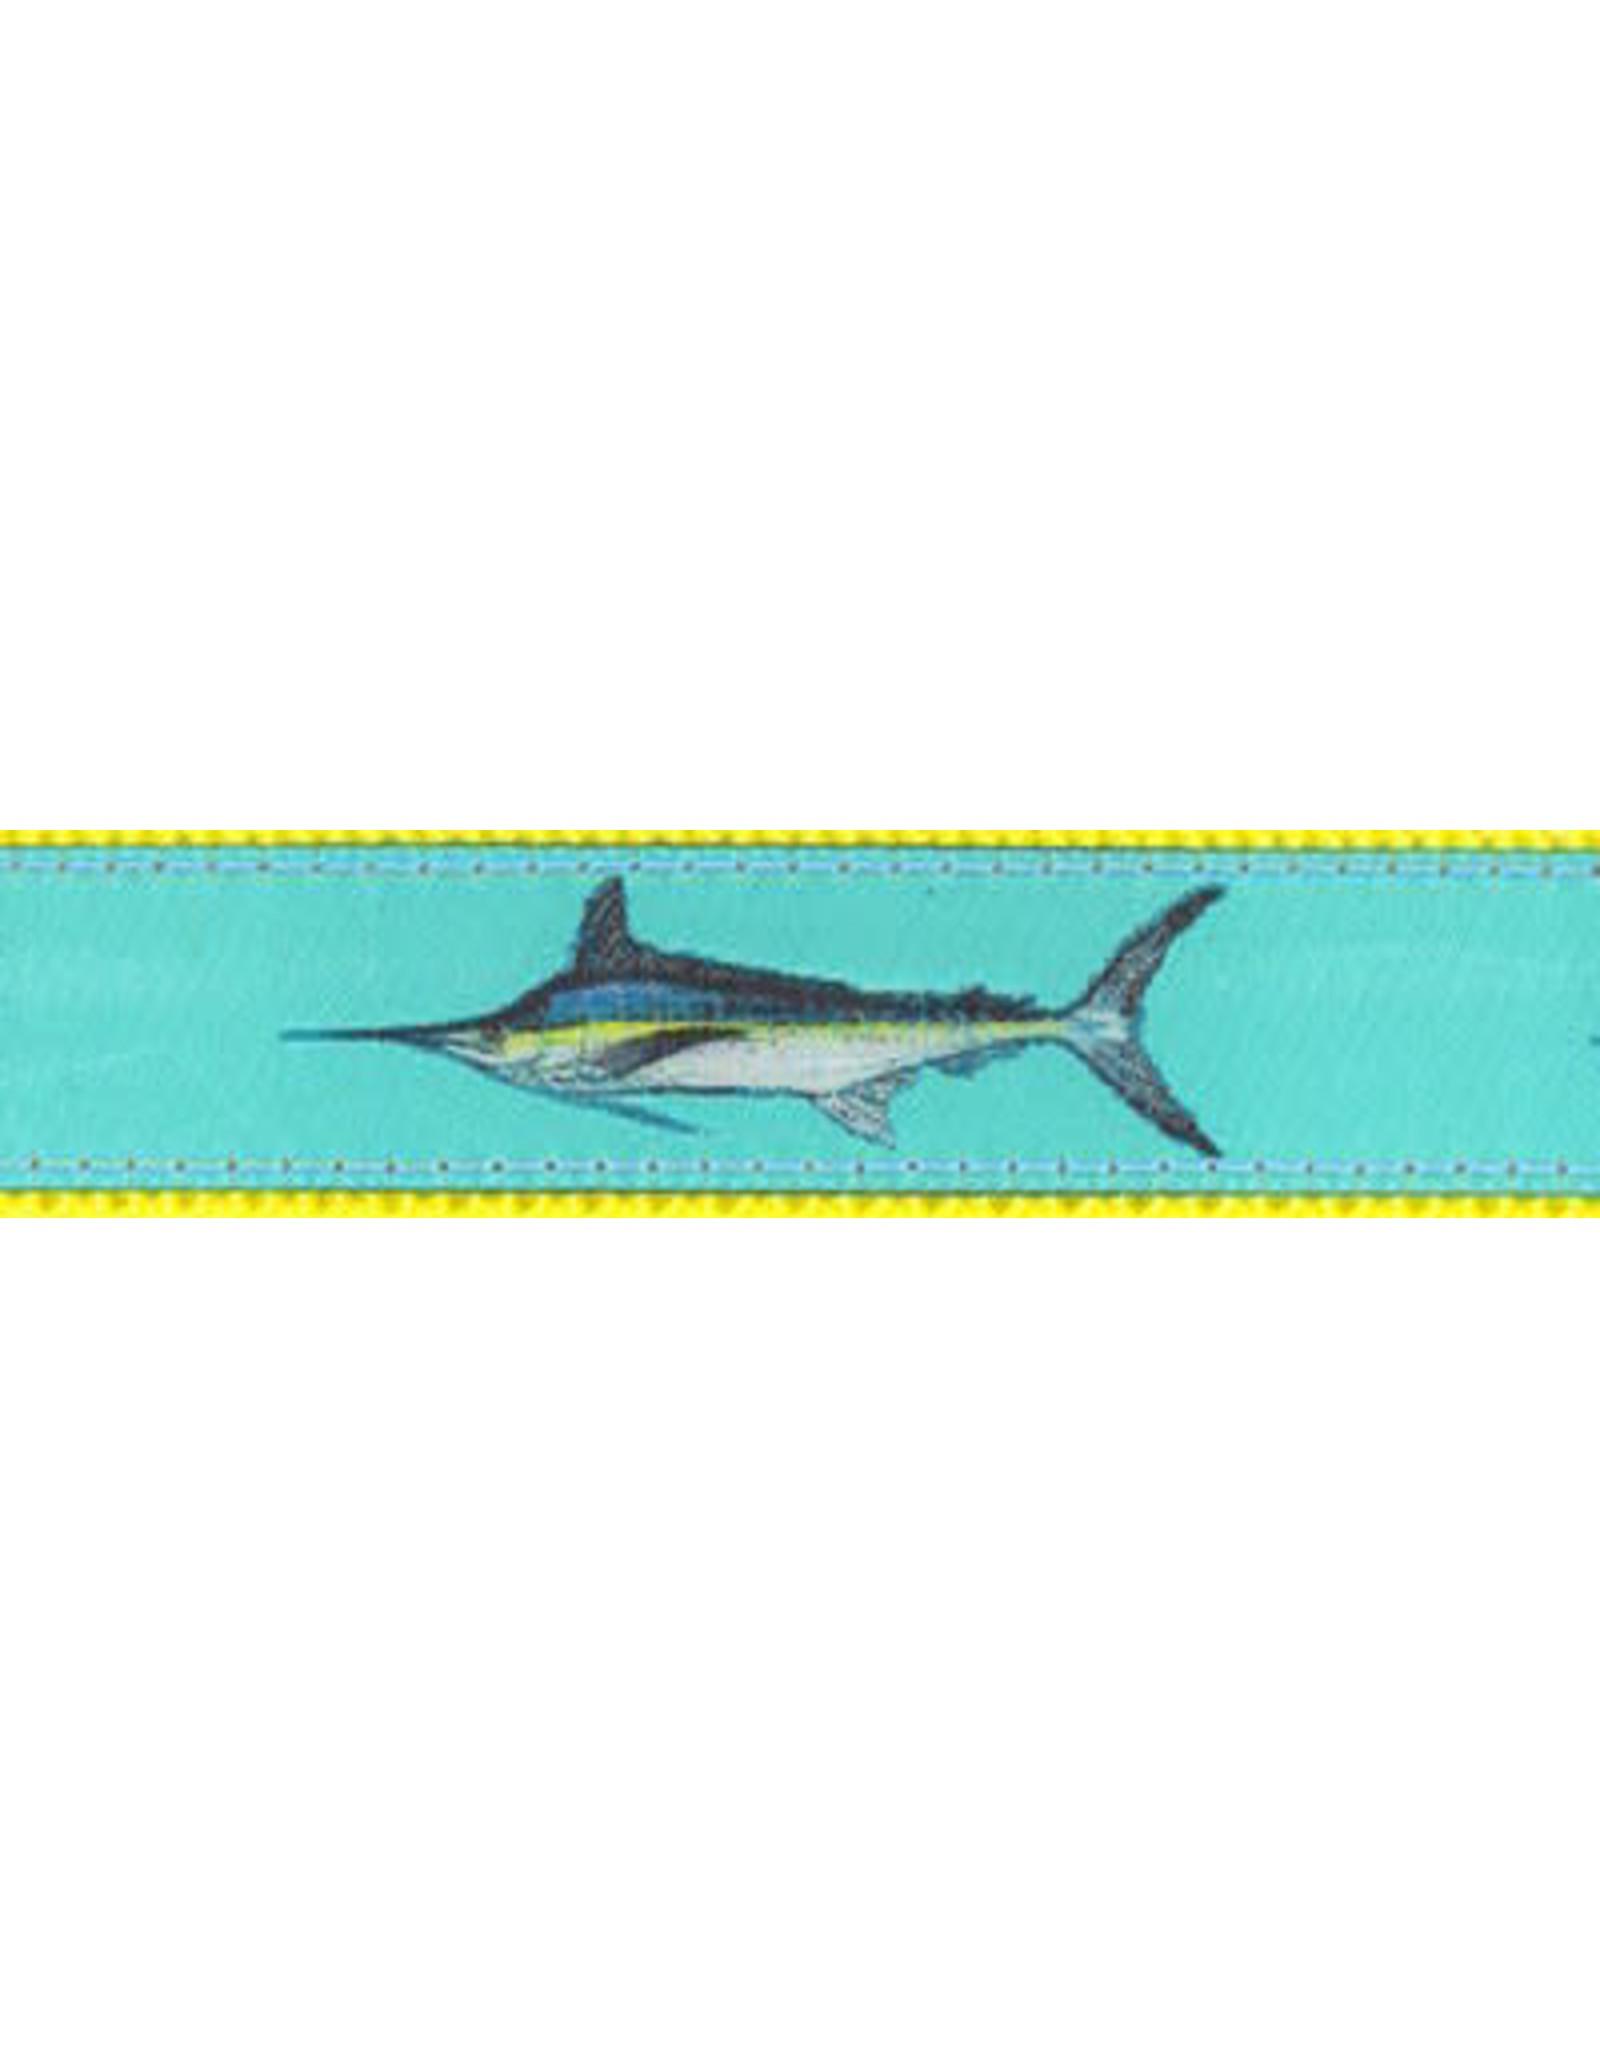 Preston Ribbons Teal Marlin Dog Lead